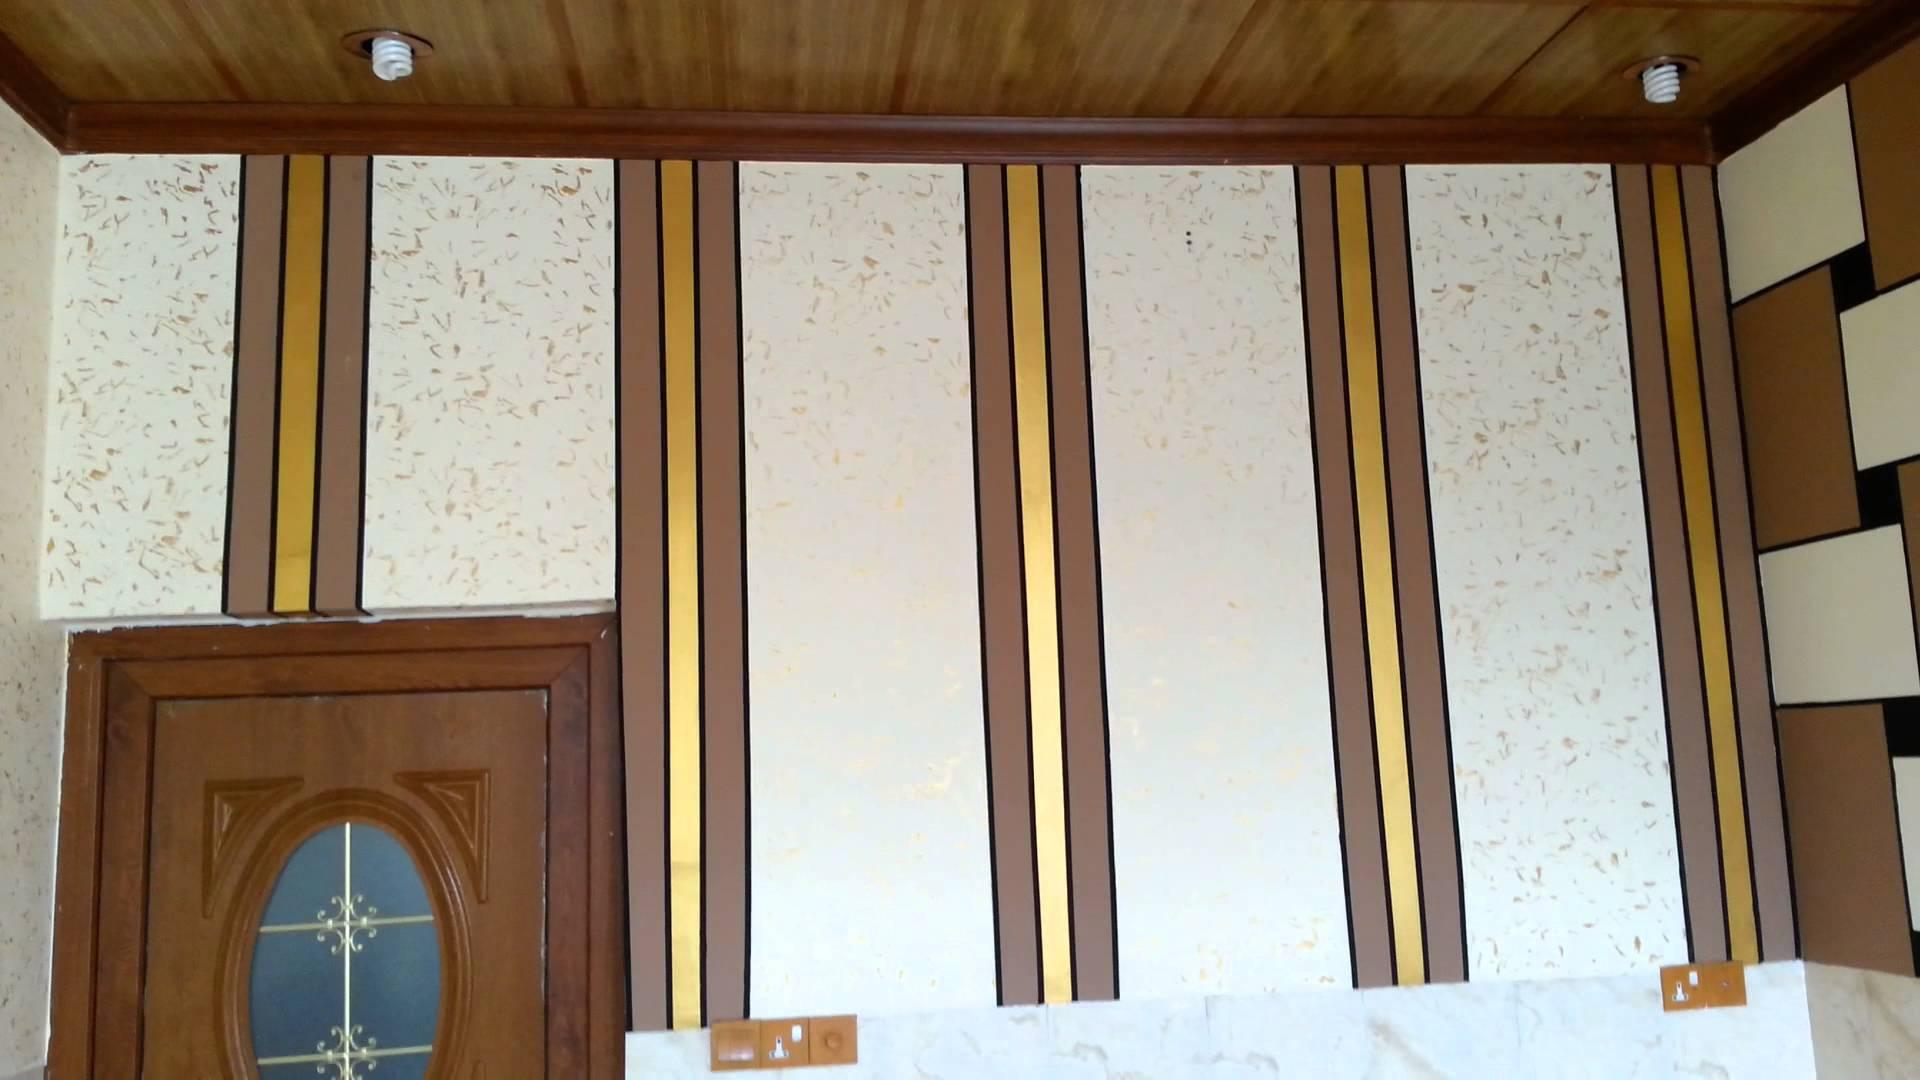 صور تغليف جدران , صور ديكور جدار المنزل